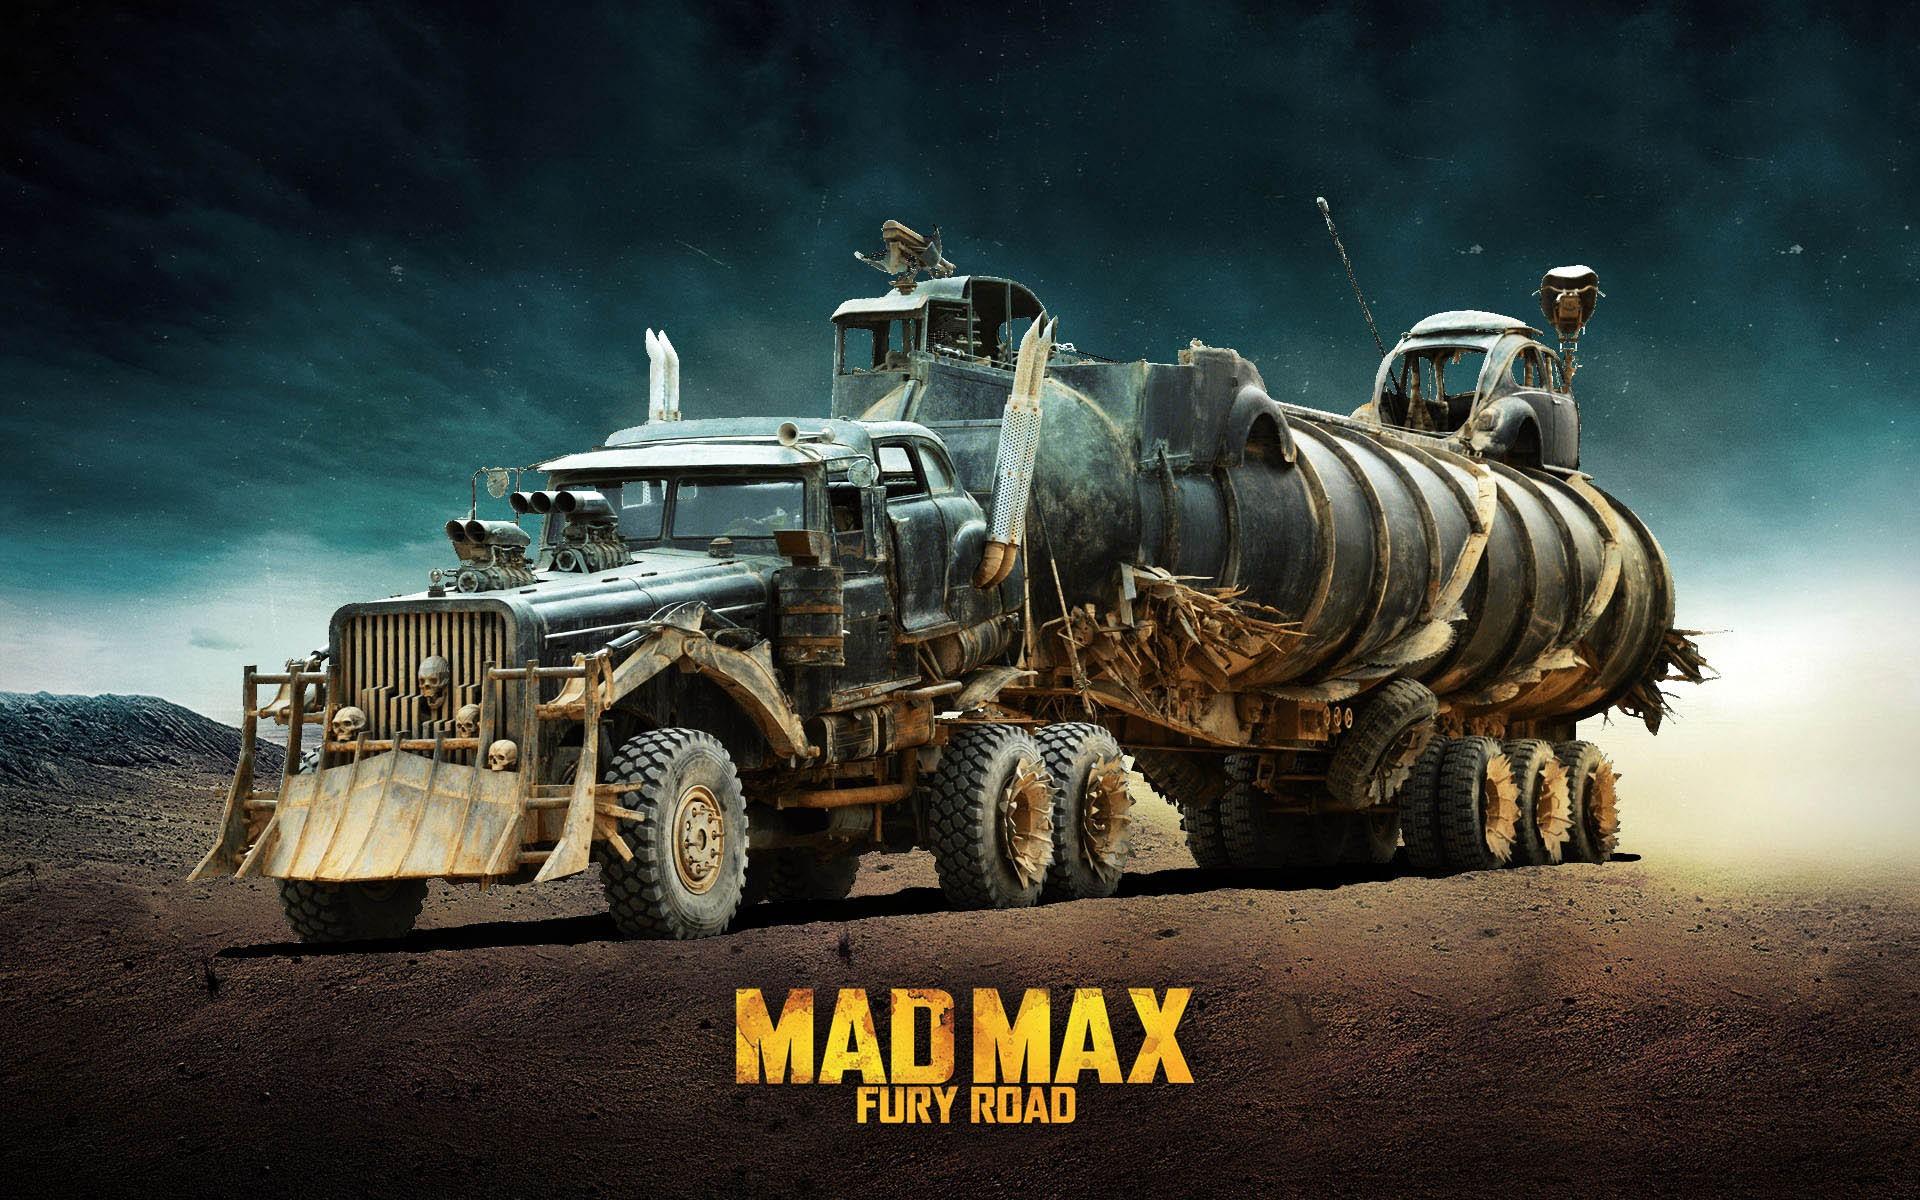 Mad Max Fury Road wallpaper ·① Download free beautiful ...